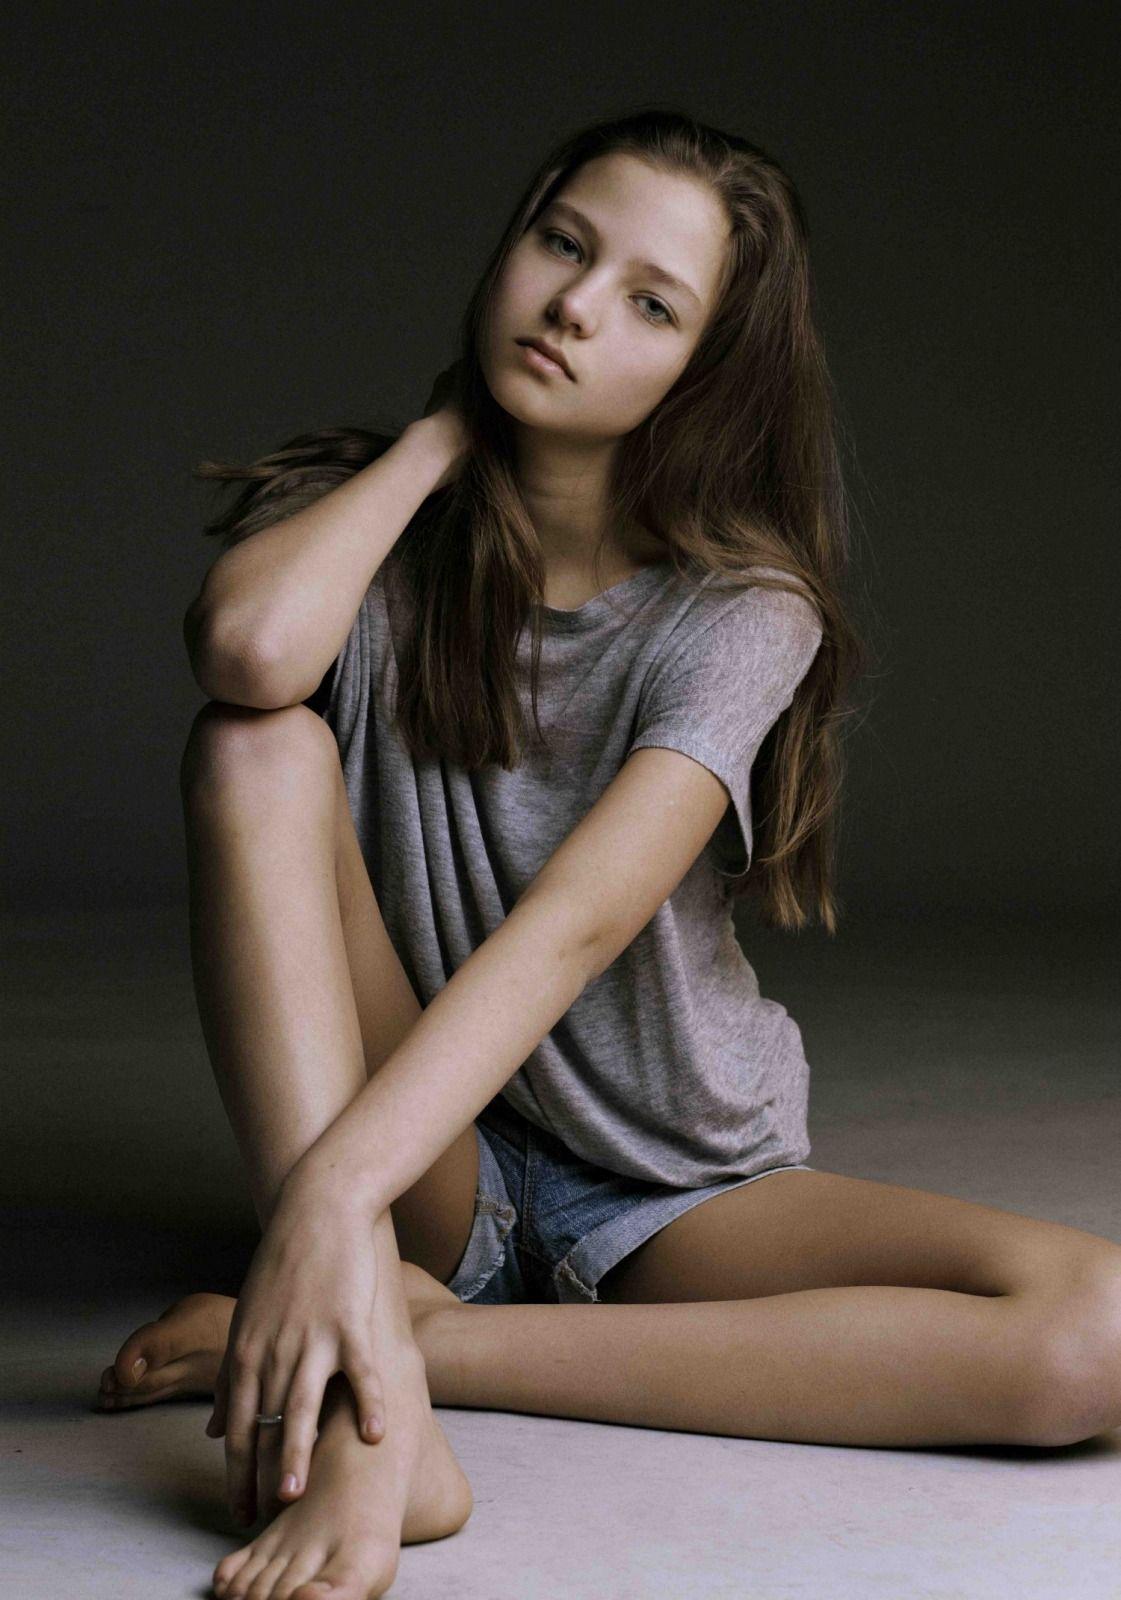 Feet Alesya Kafelnikova nude photos 2019